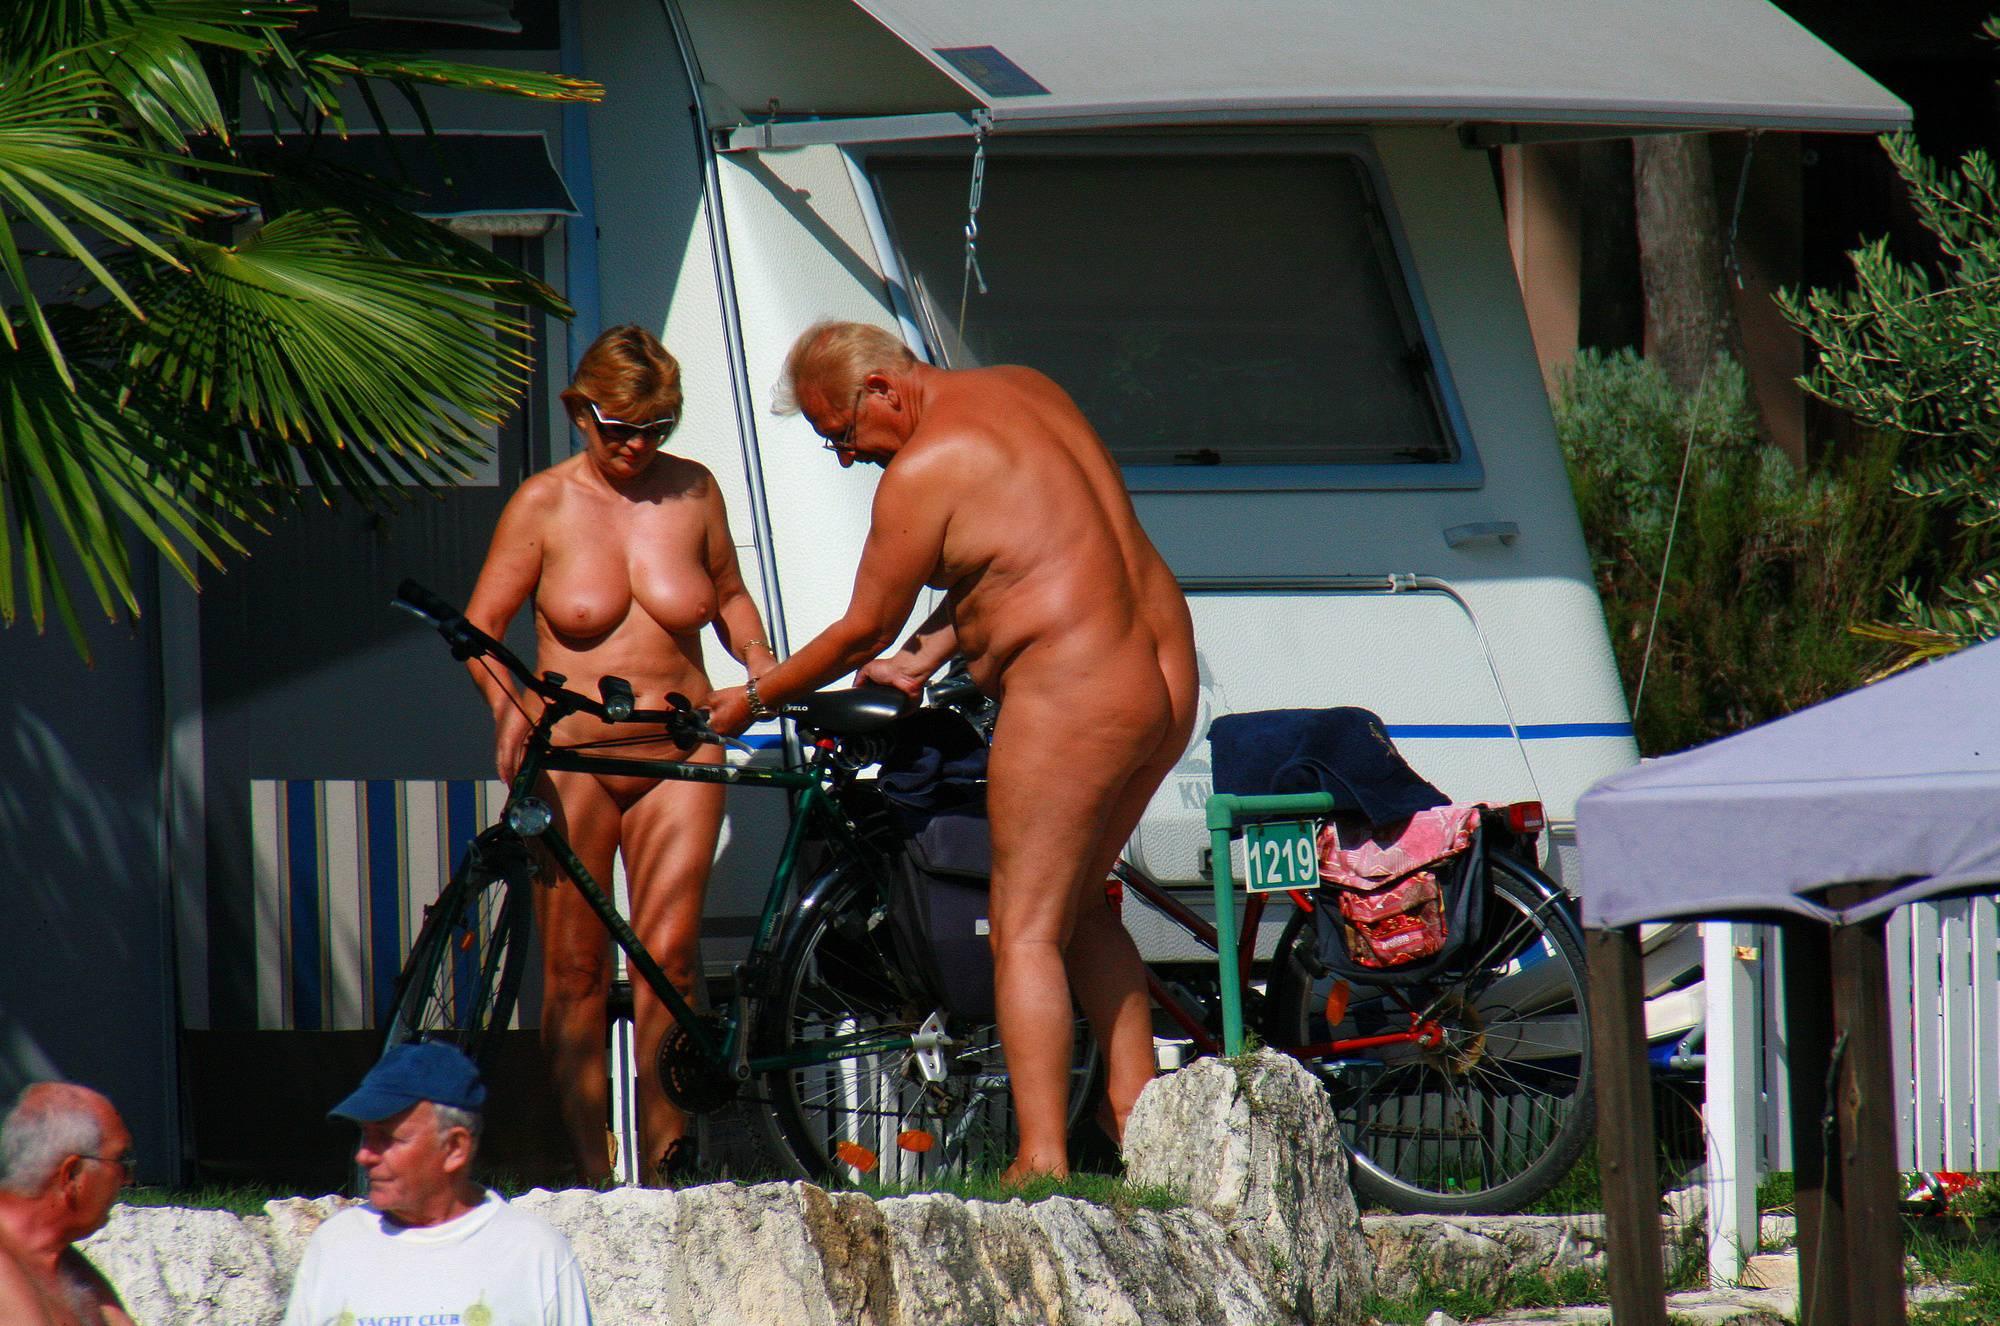 Nudist Pics Uka FKK Outdoor Biking - 2